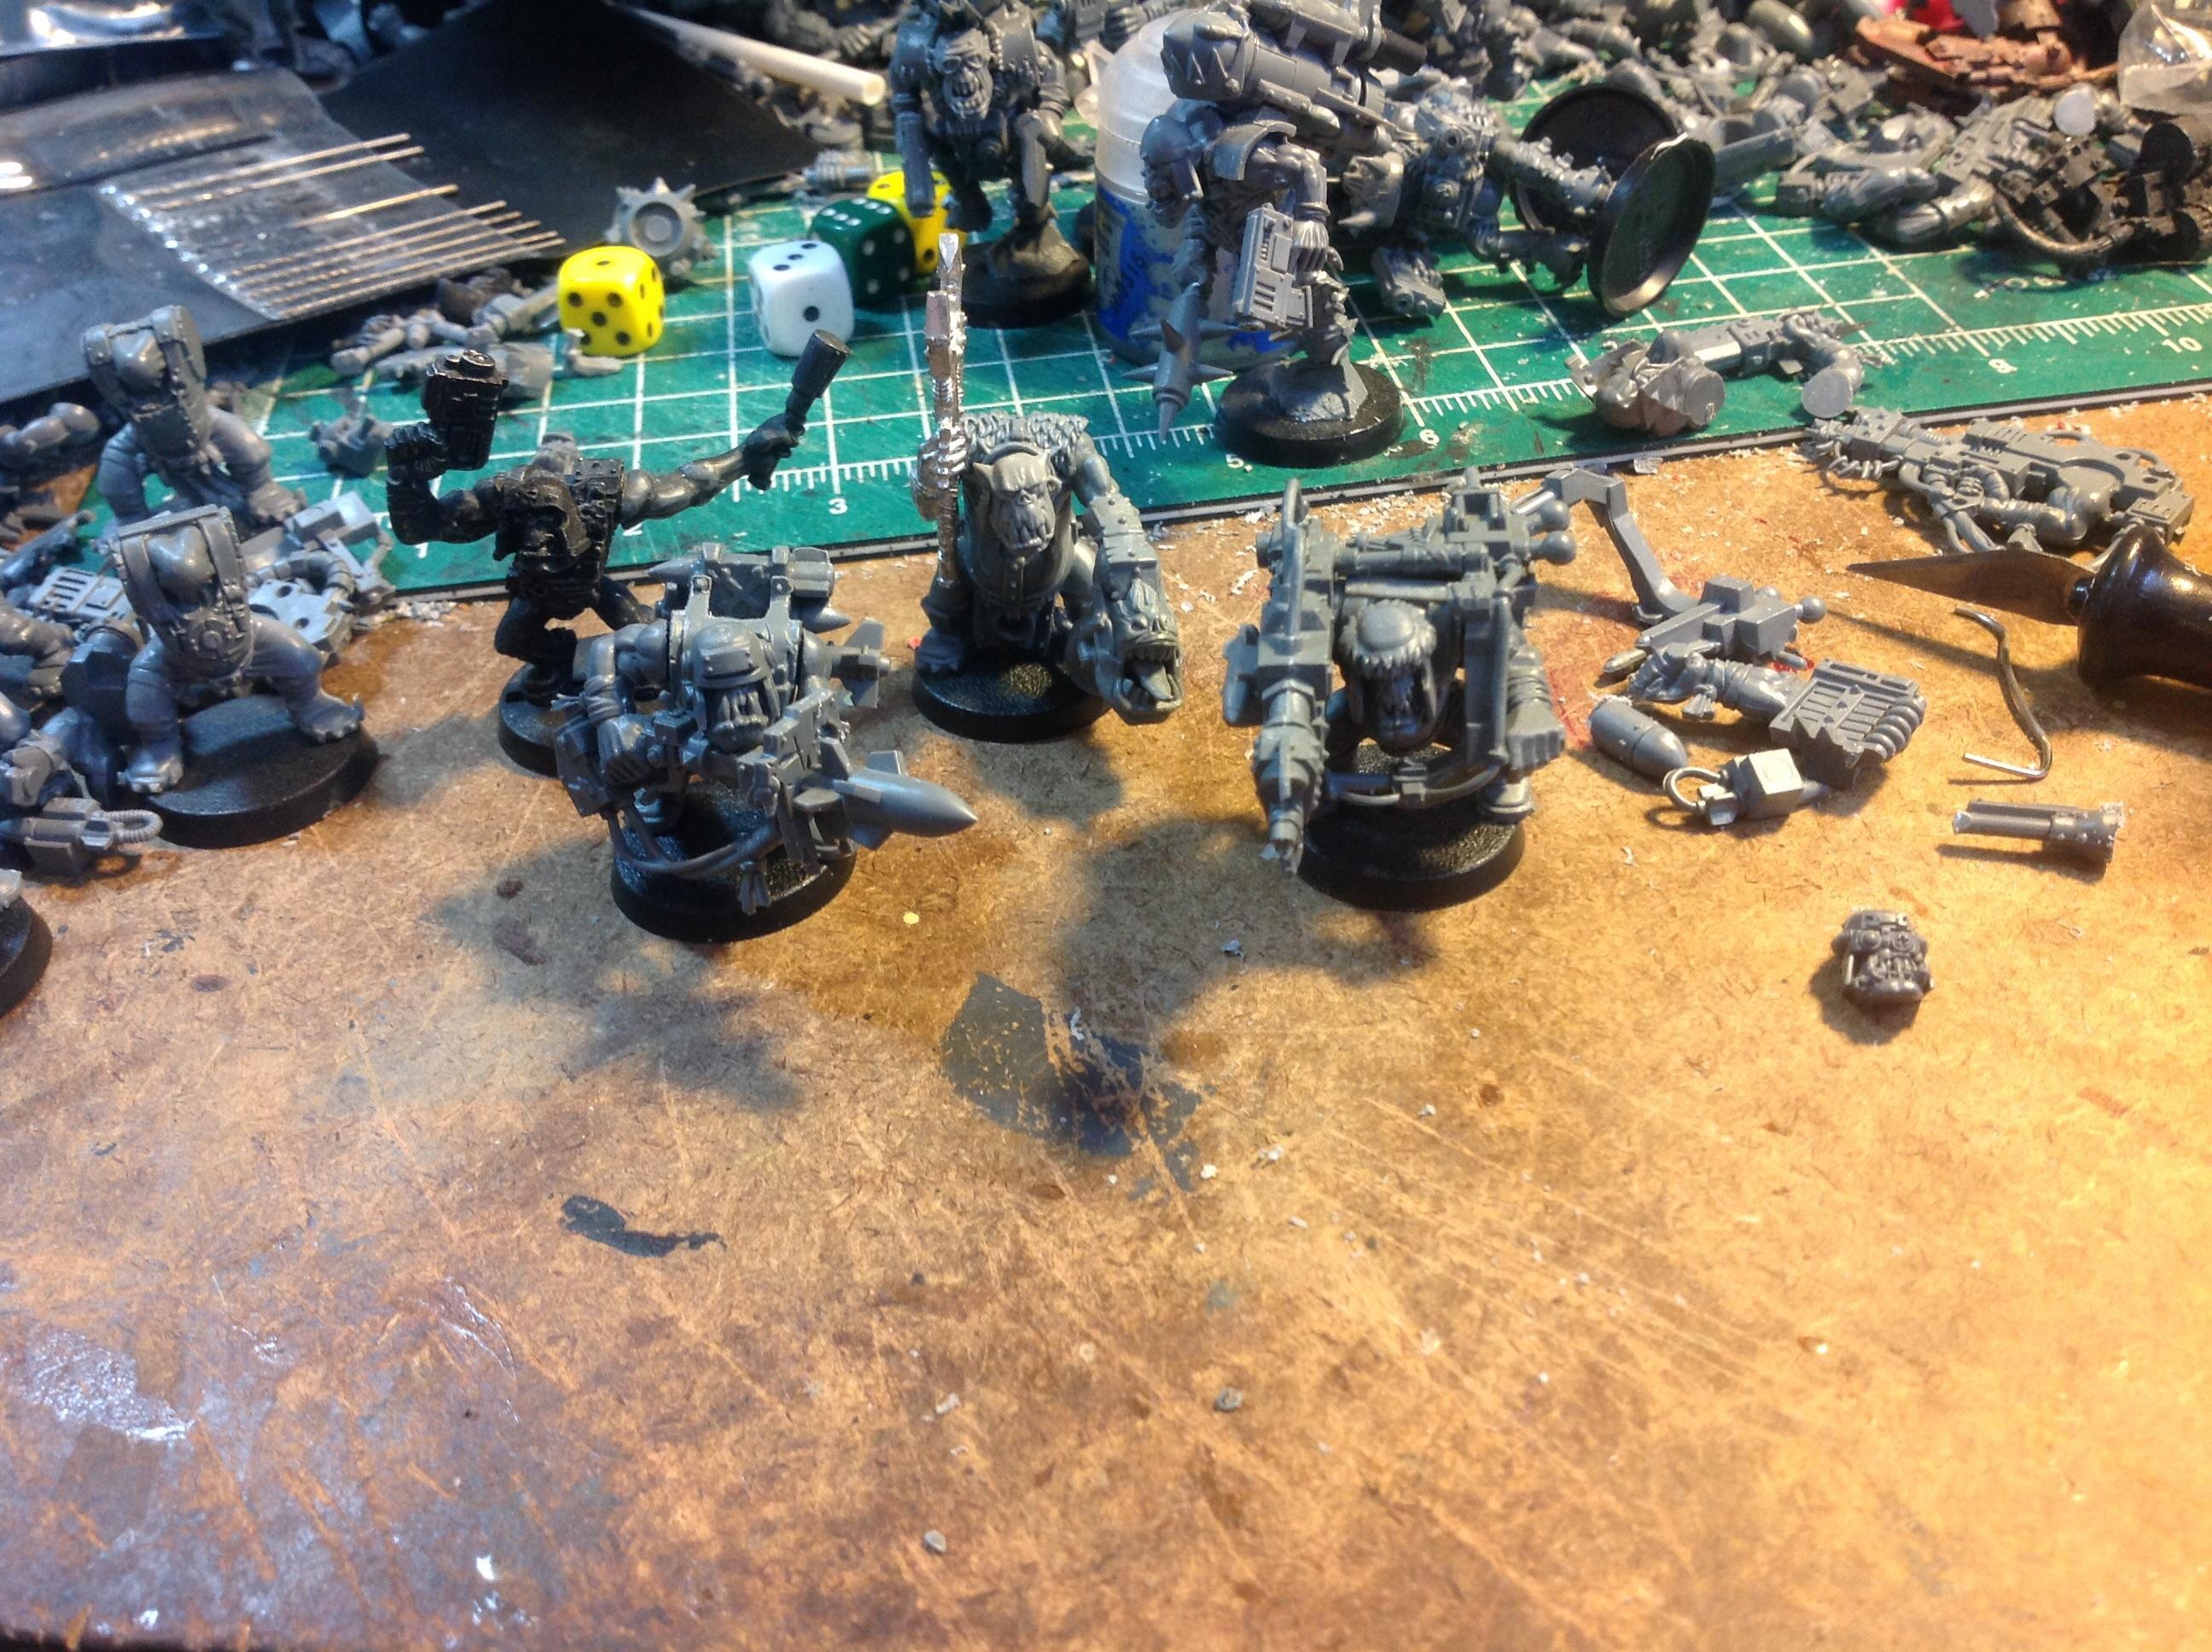 Attack Squig, Boys, Lootas, Orks, Progress, Stikk Bomma, Tankbustas, Waaazag, Warhammer 40,000